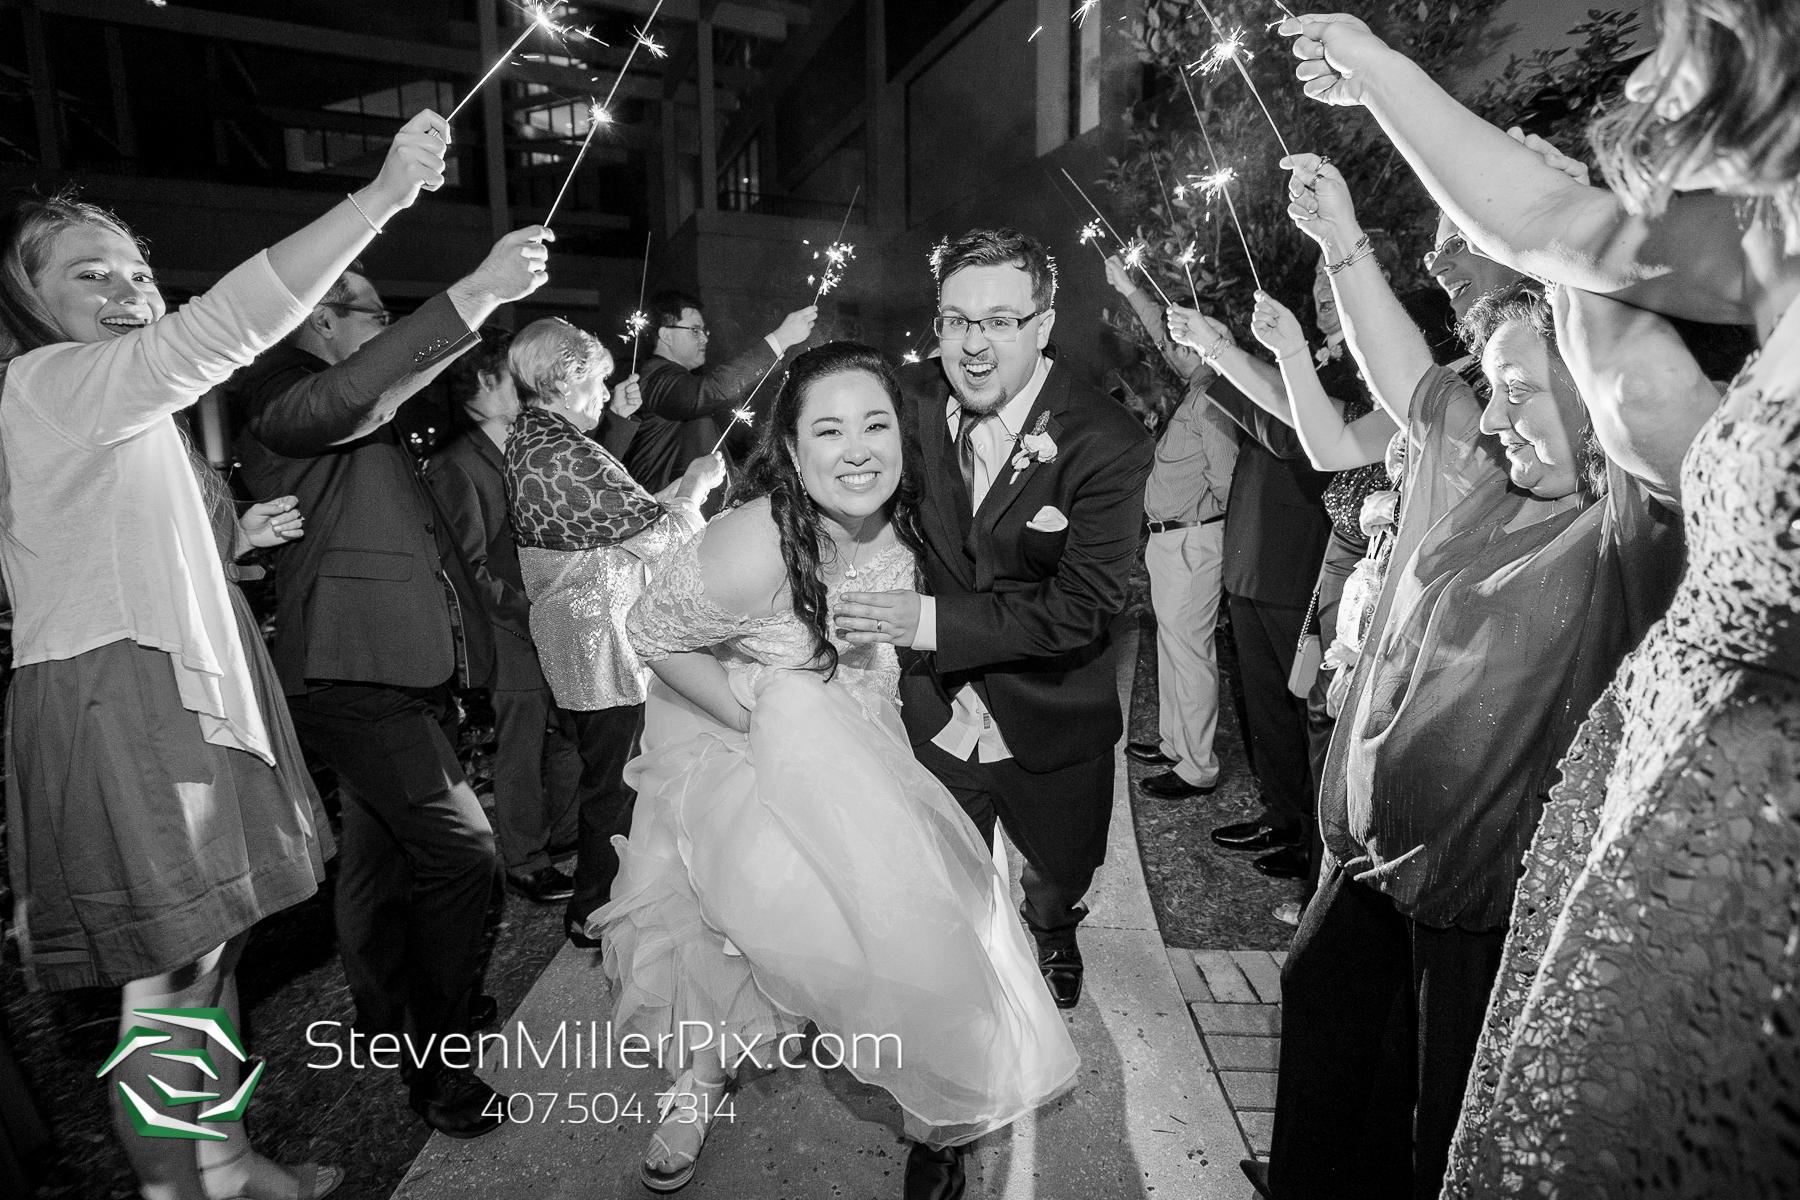 March Wedding | The Hyatt Regency Grand Cypress Wedding of Alyssa and Shane